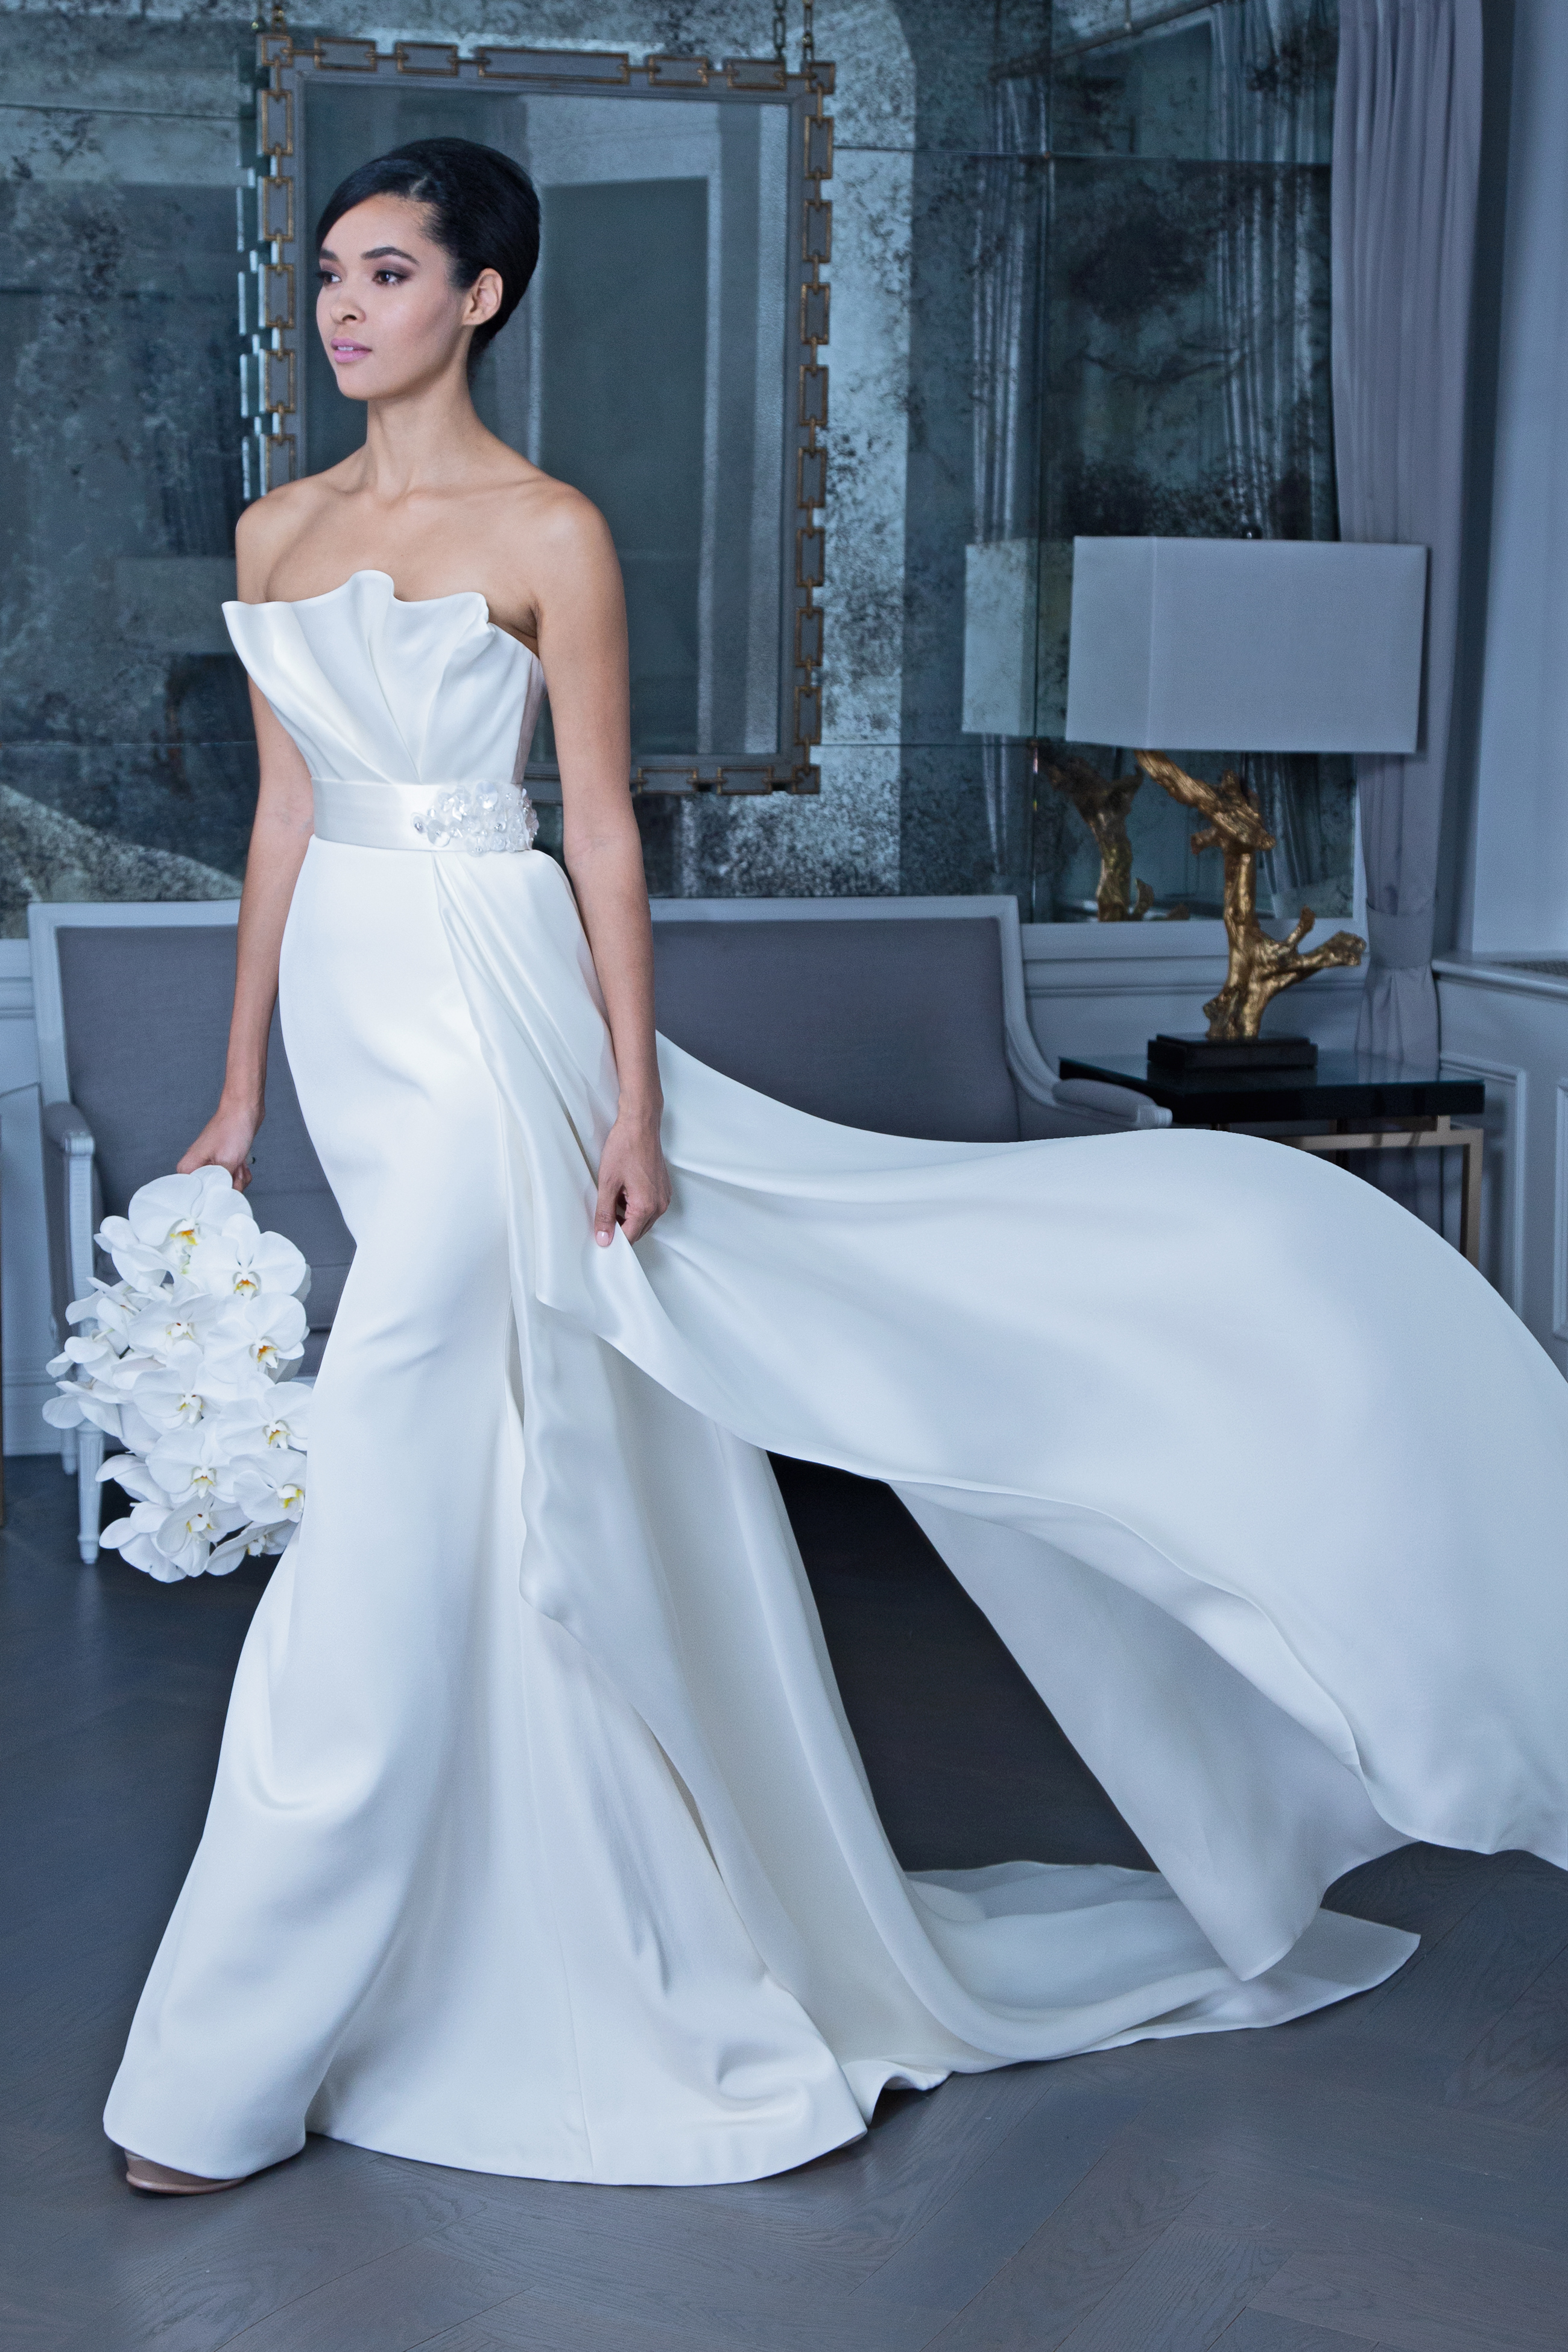 Romona strapless wedding dress with train fall 2019